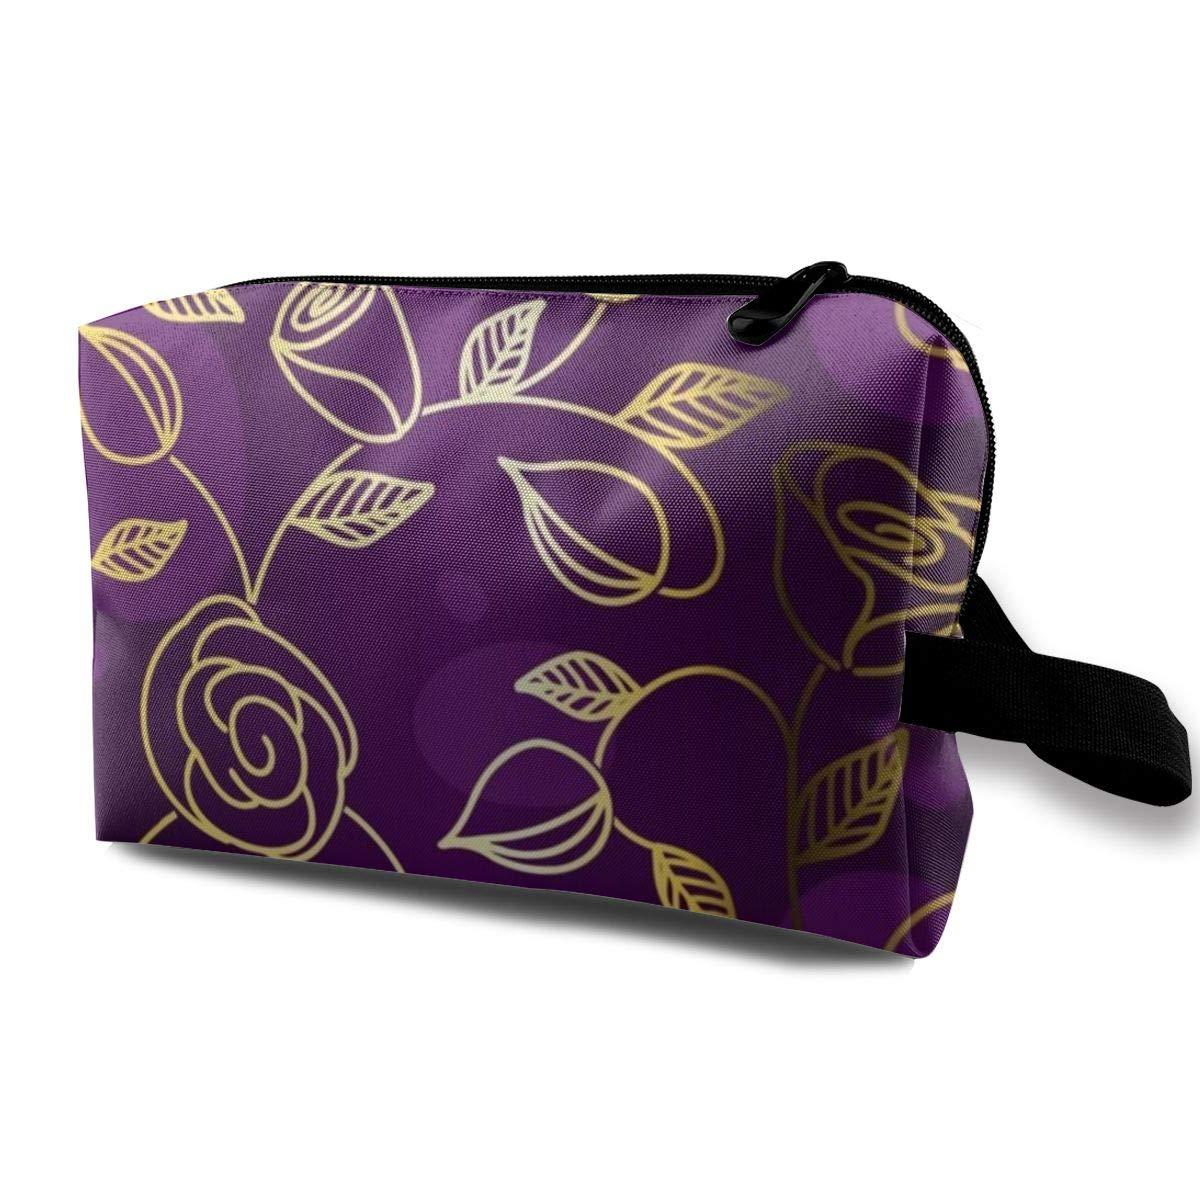 Travel Toiletry Bag Zippers Toiletries Makeup Bag Cosmetic Organizer Shaving Bag (Gold Rose Floral Flower Purple)